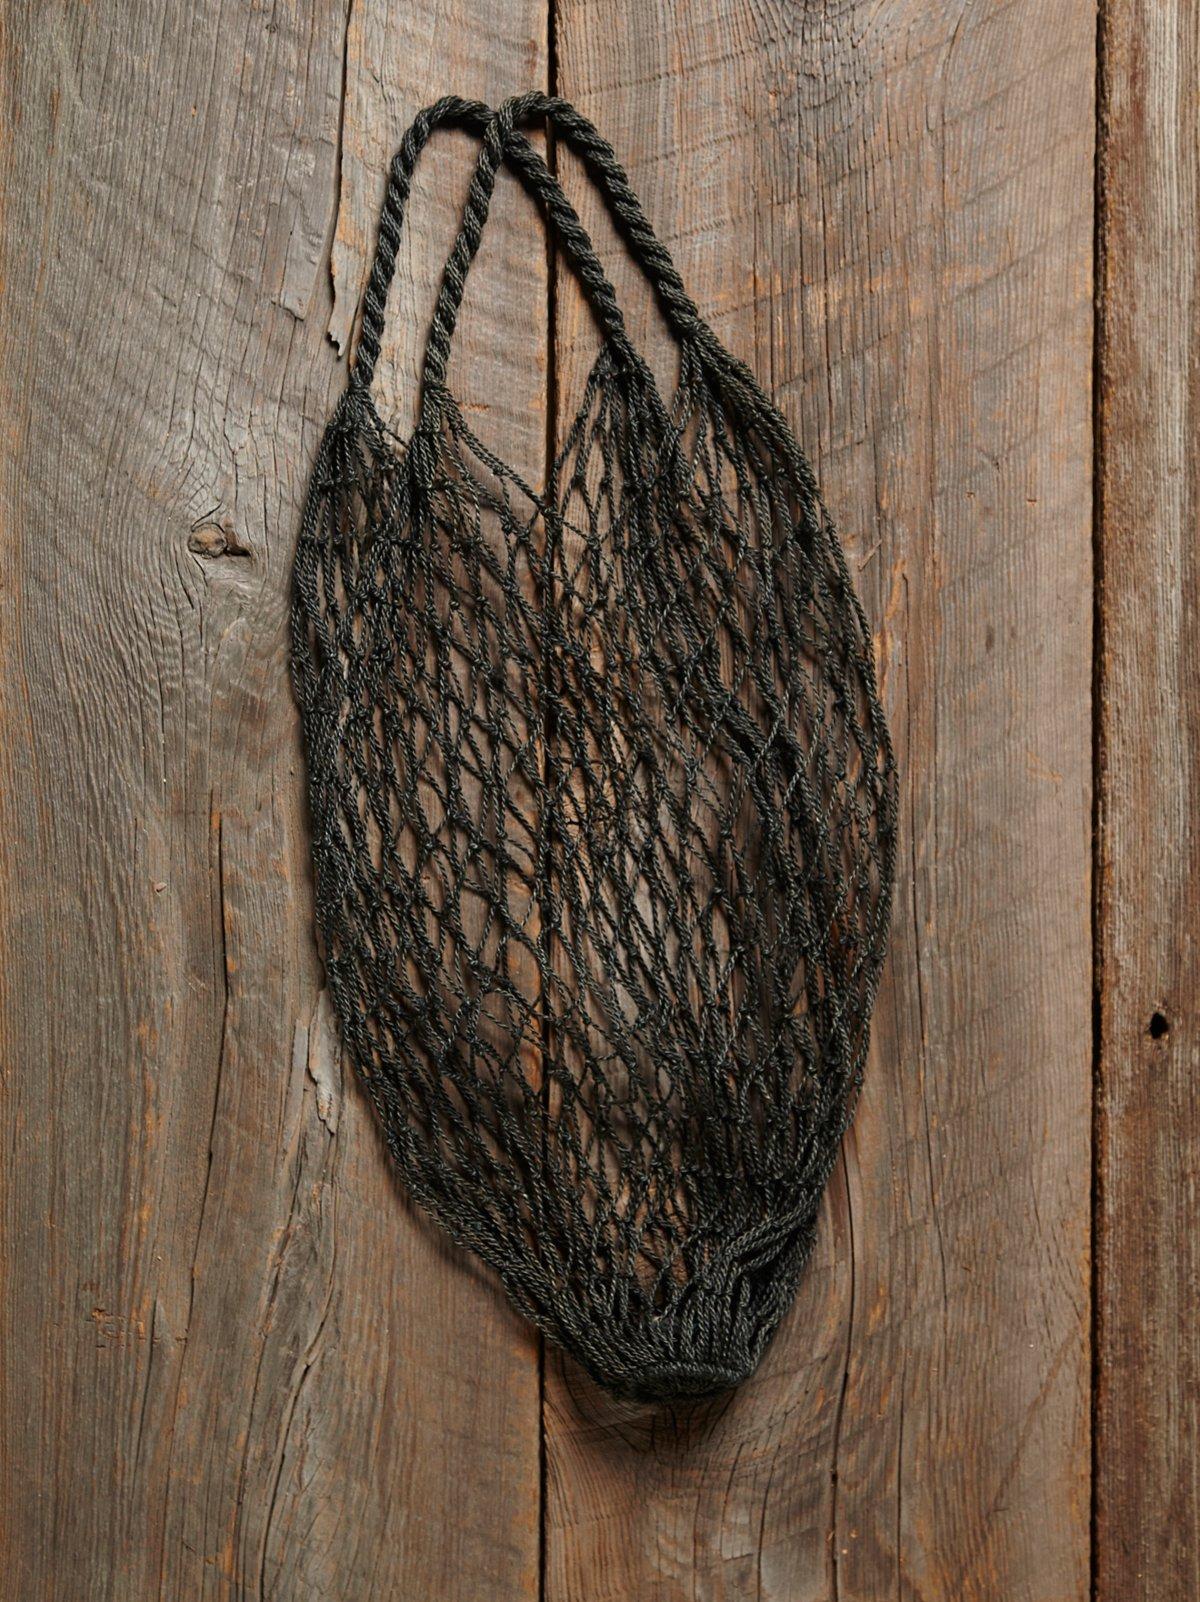 Vintage Indigo Net Bag